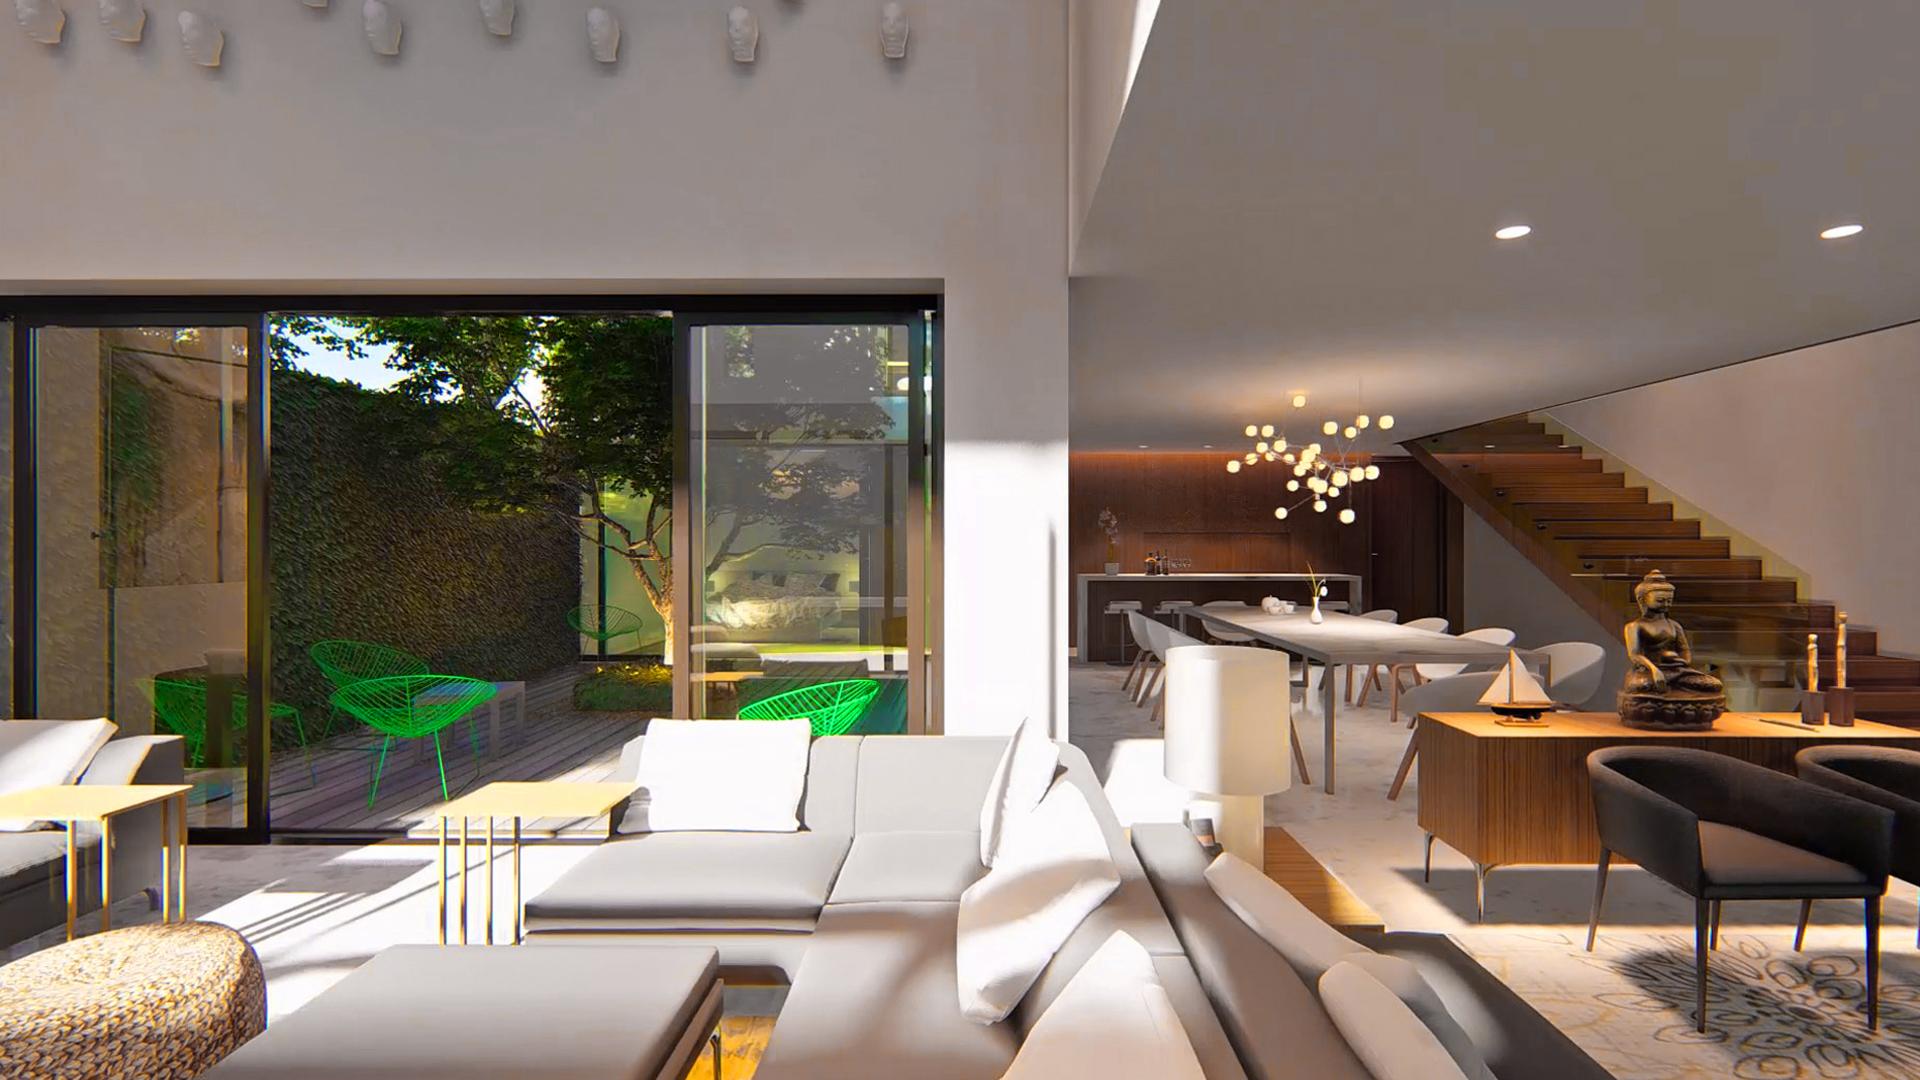 MAP_Design_House_Architecture_Modern_Architect_Kiran_Mathema_Veranda_Front_Living_Dining